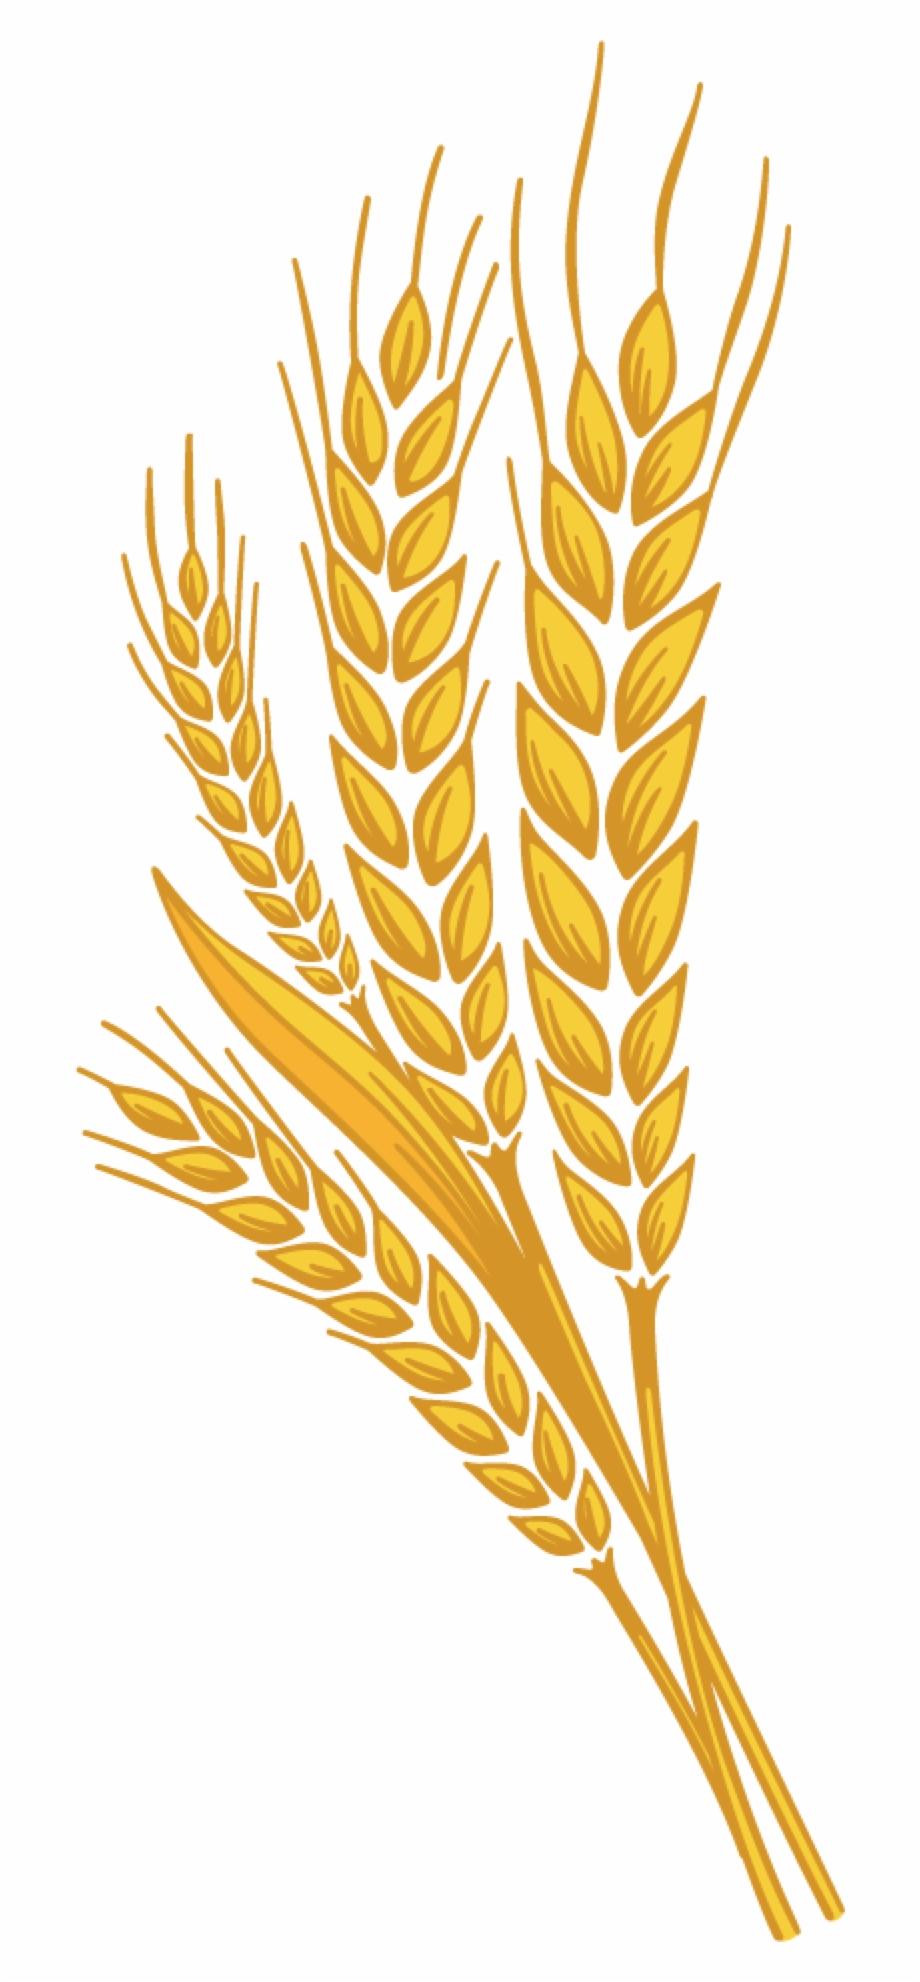 Free Wheat Stalk Png, Download Free Clip Art, Free Clip Art.